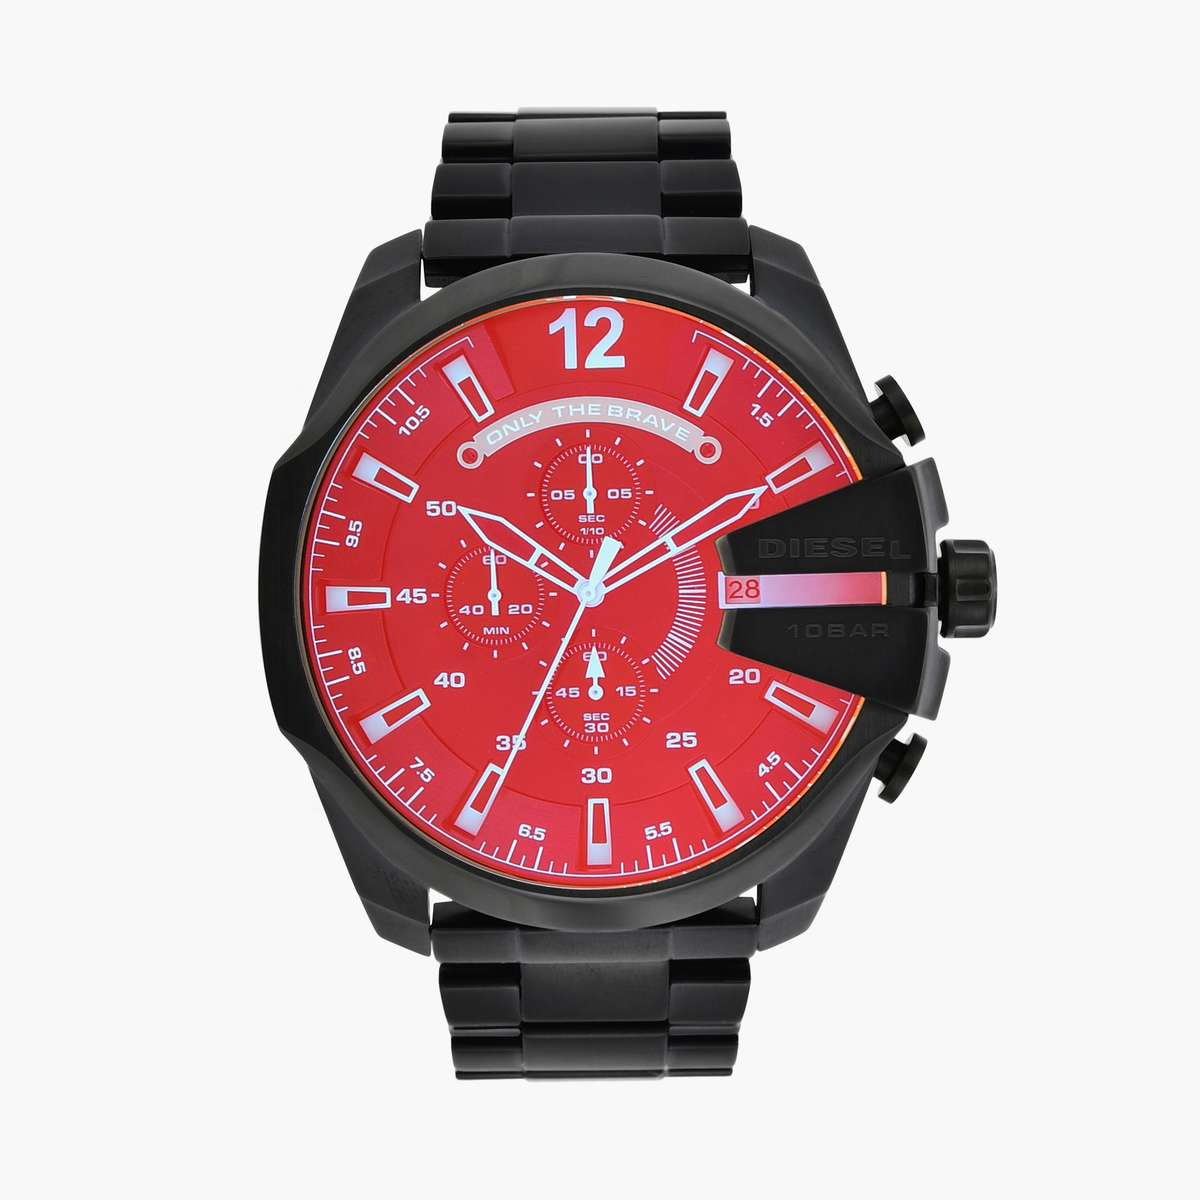 DIESEL Mega Men Chronograph Watch- DZ4318